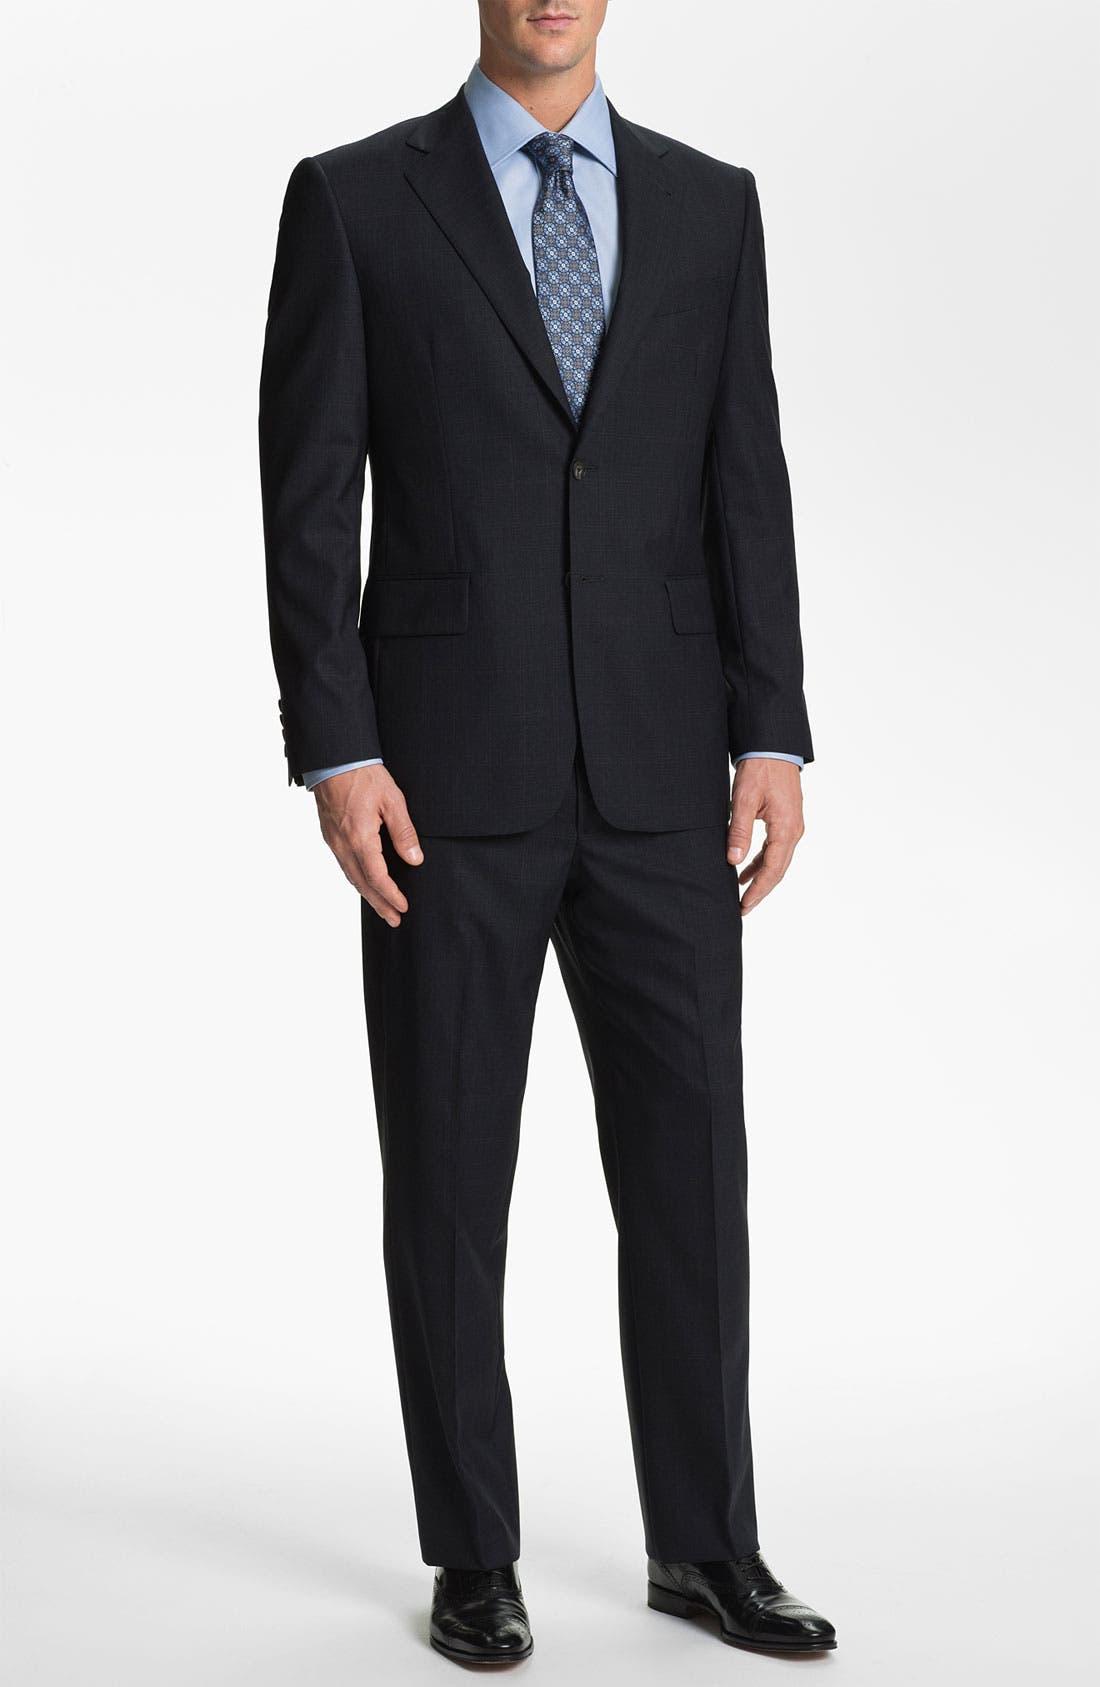 Alternate Image 1 Selected - Joseph Abboud Windowpane Wool Suit